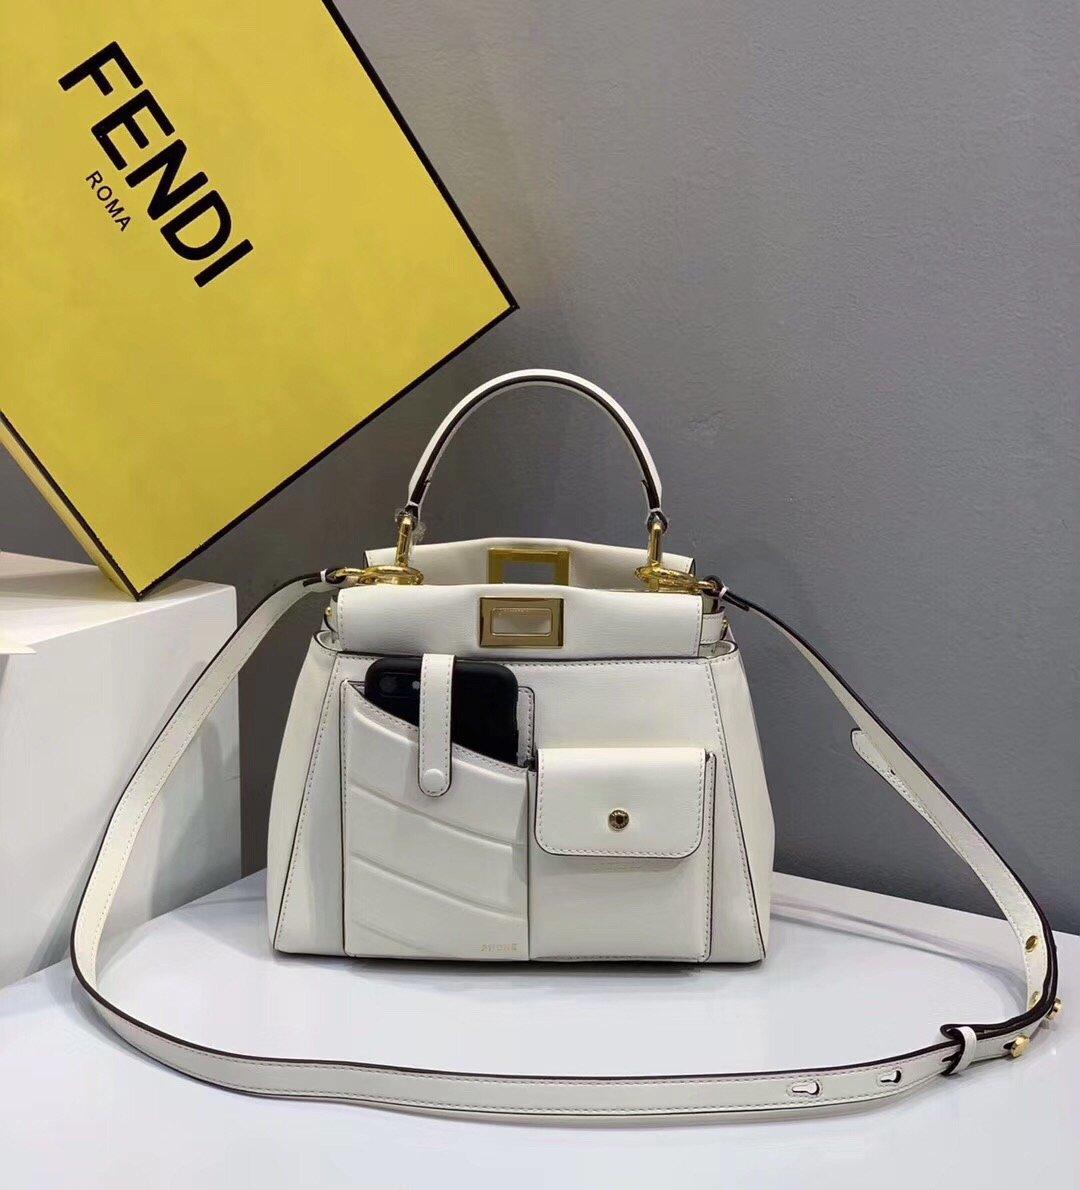 Replica Fendi Peekaboo Iconic Mini White Leather Bag